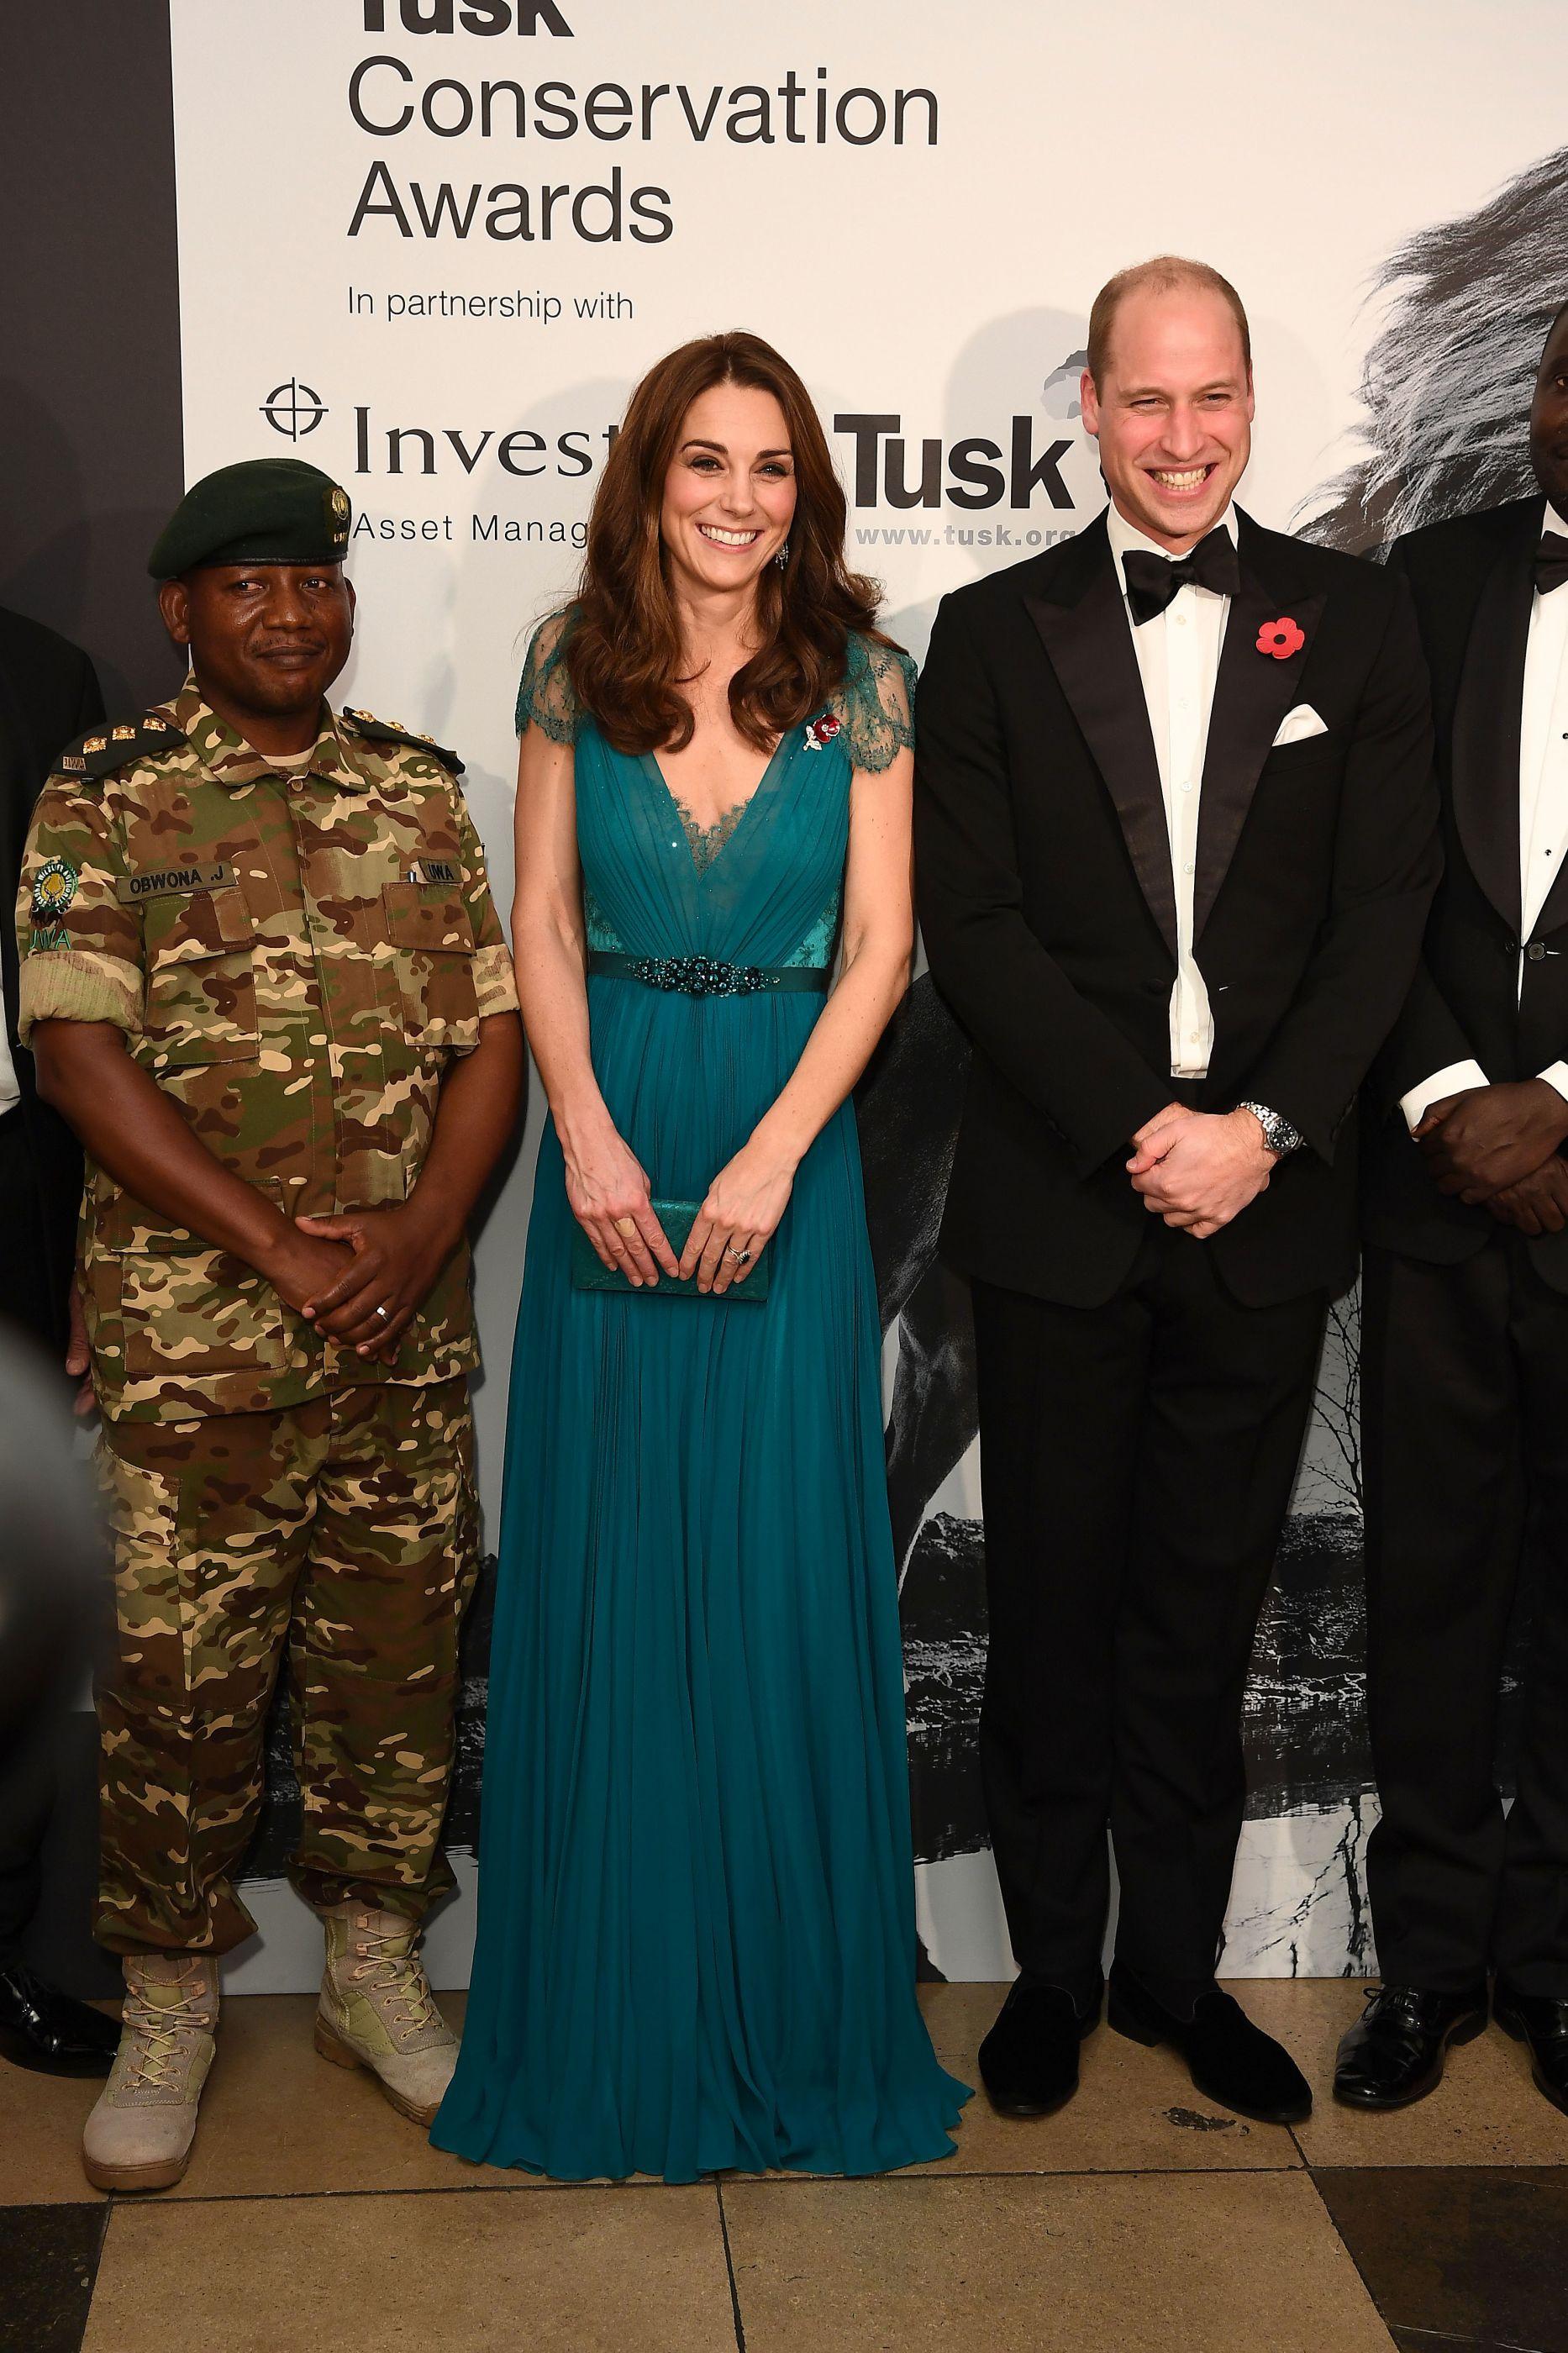 Kate Middleton repetiu vestido de gala (mas encantou na mesma)